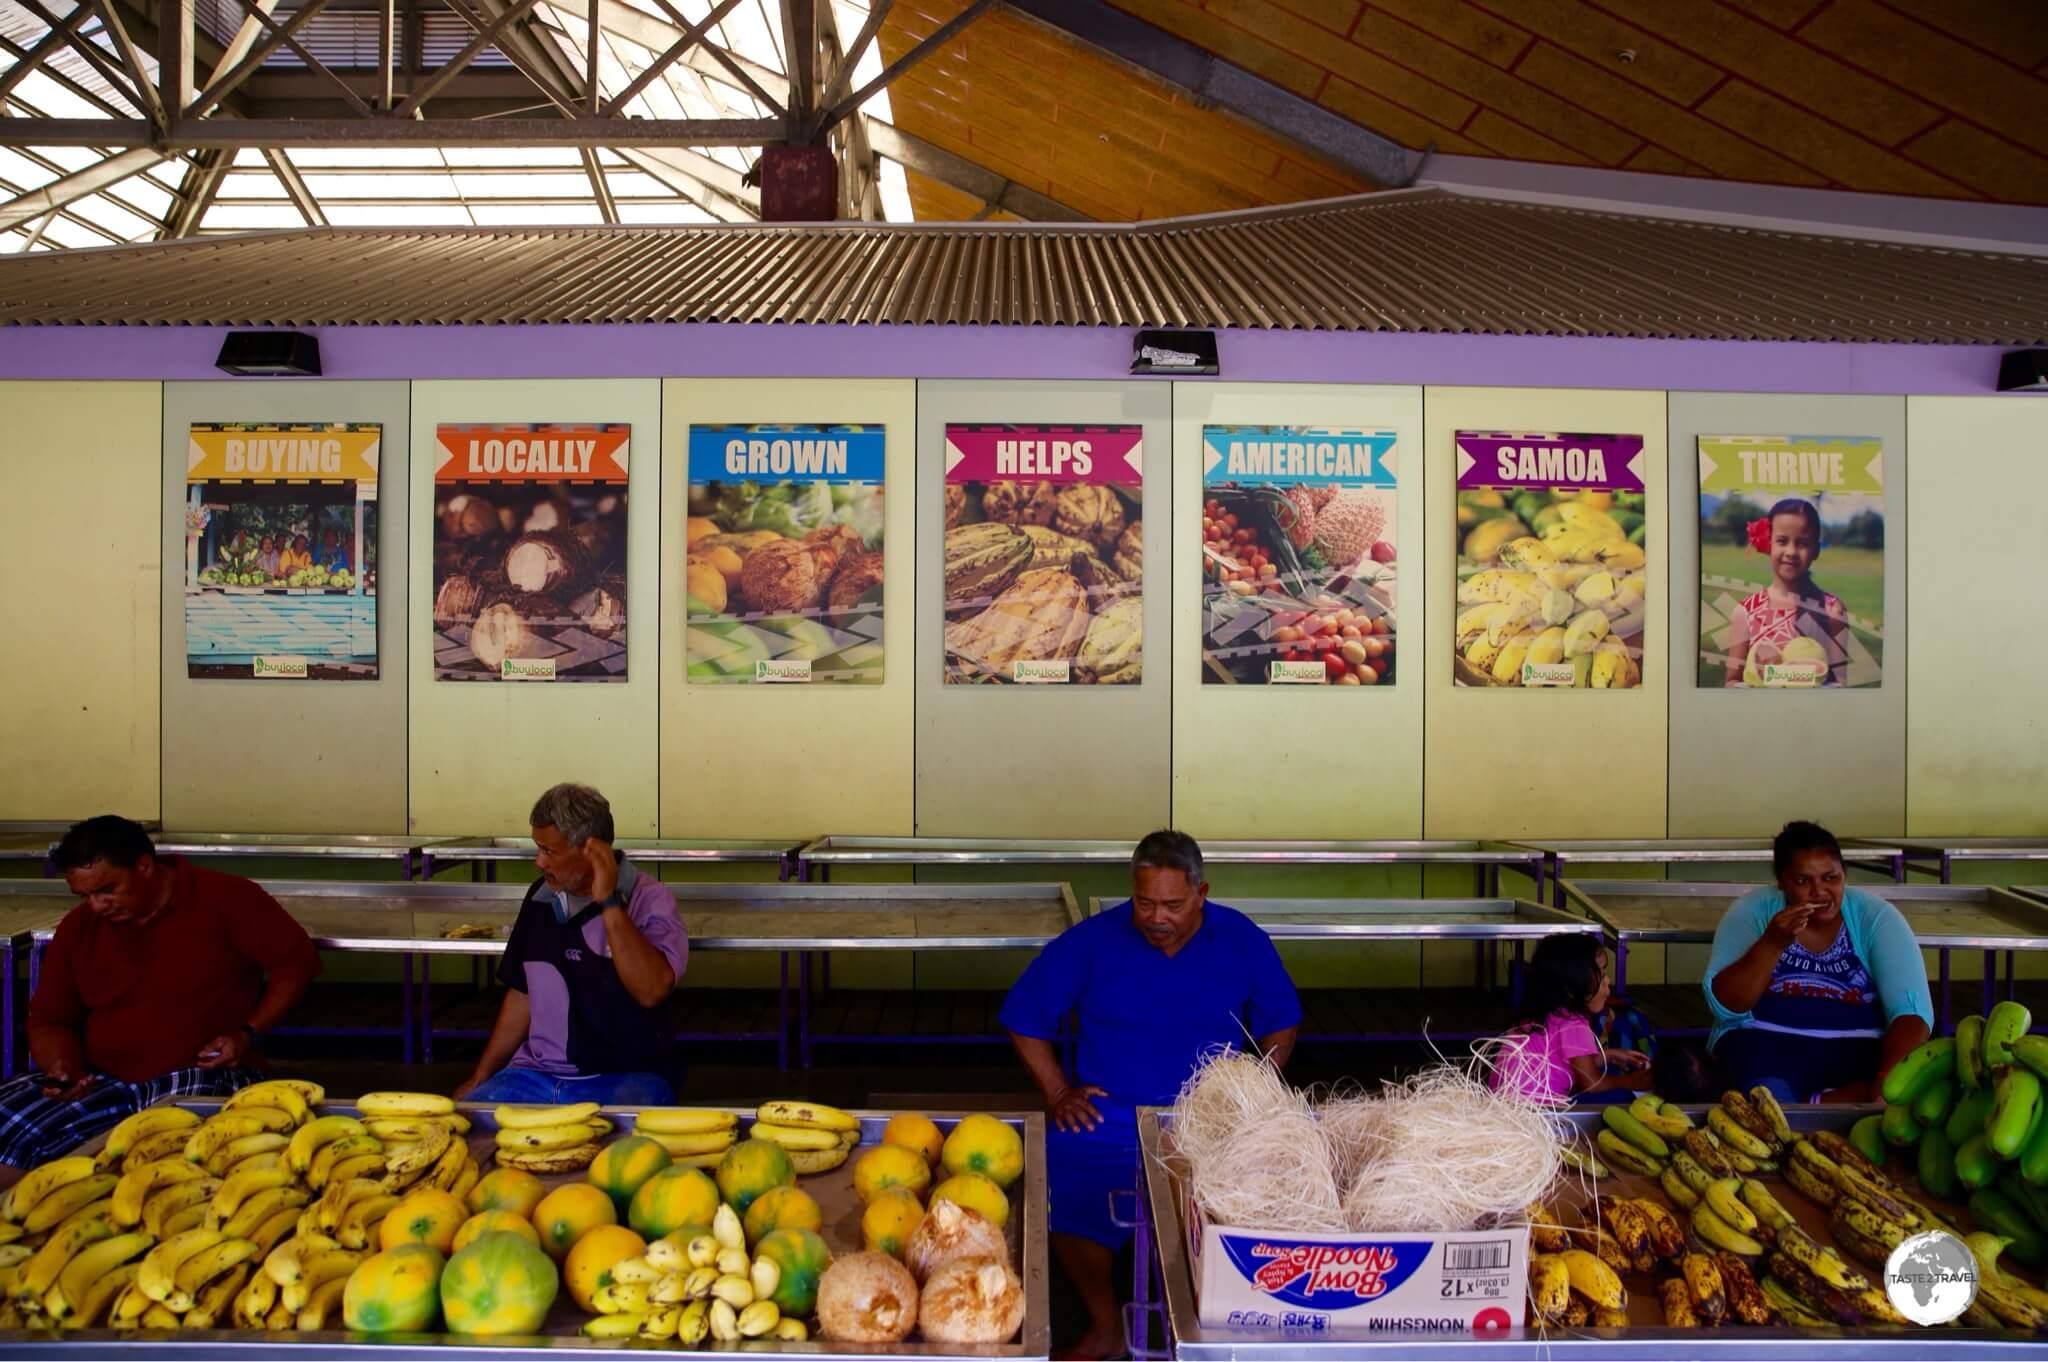 Vendors at Fagatogomarket in Pago Pago.